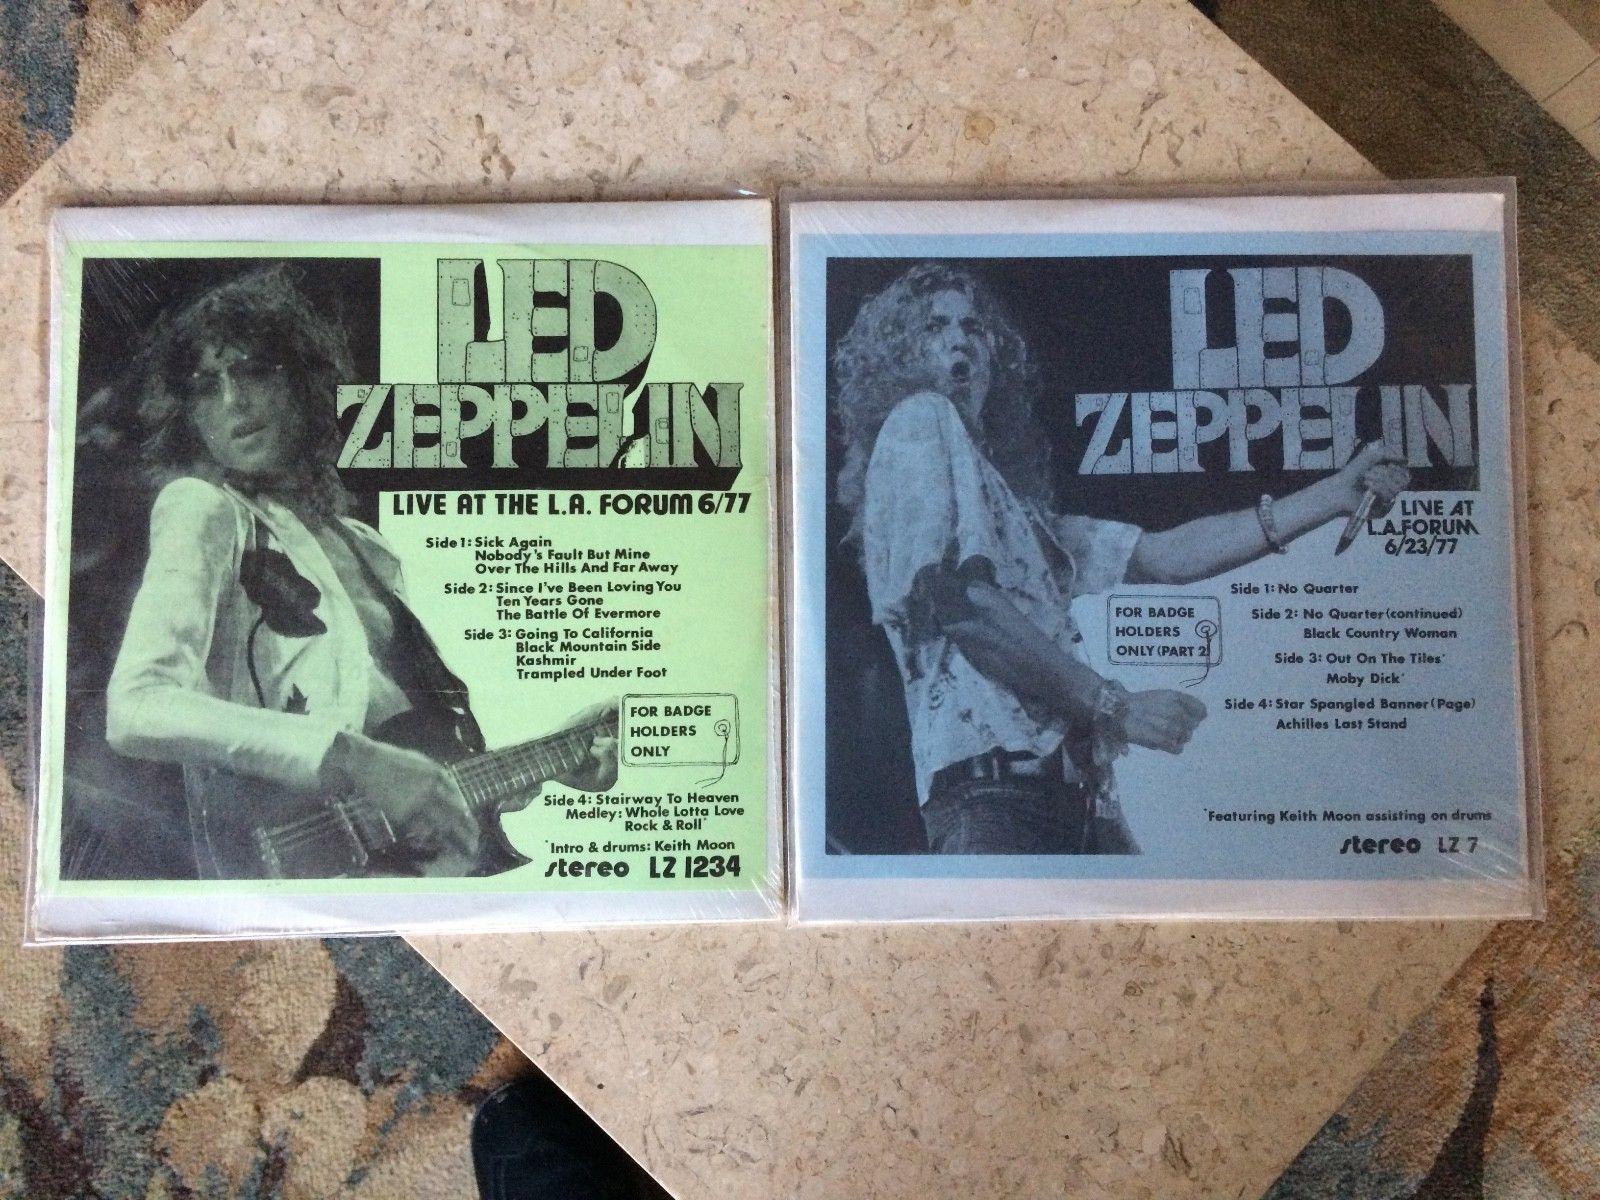 STILL SEALED Led Zeppelin For Badge Holders Only parts 1 & 2